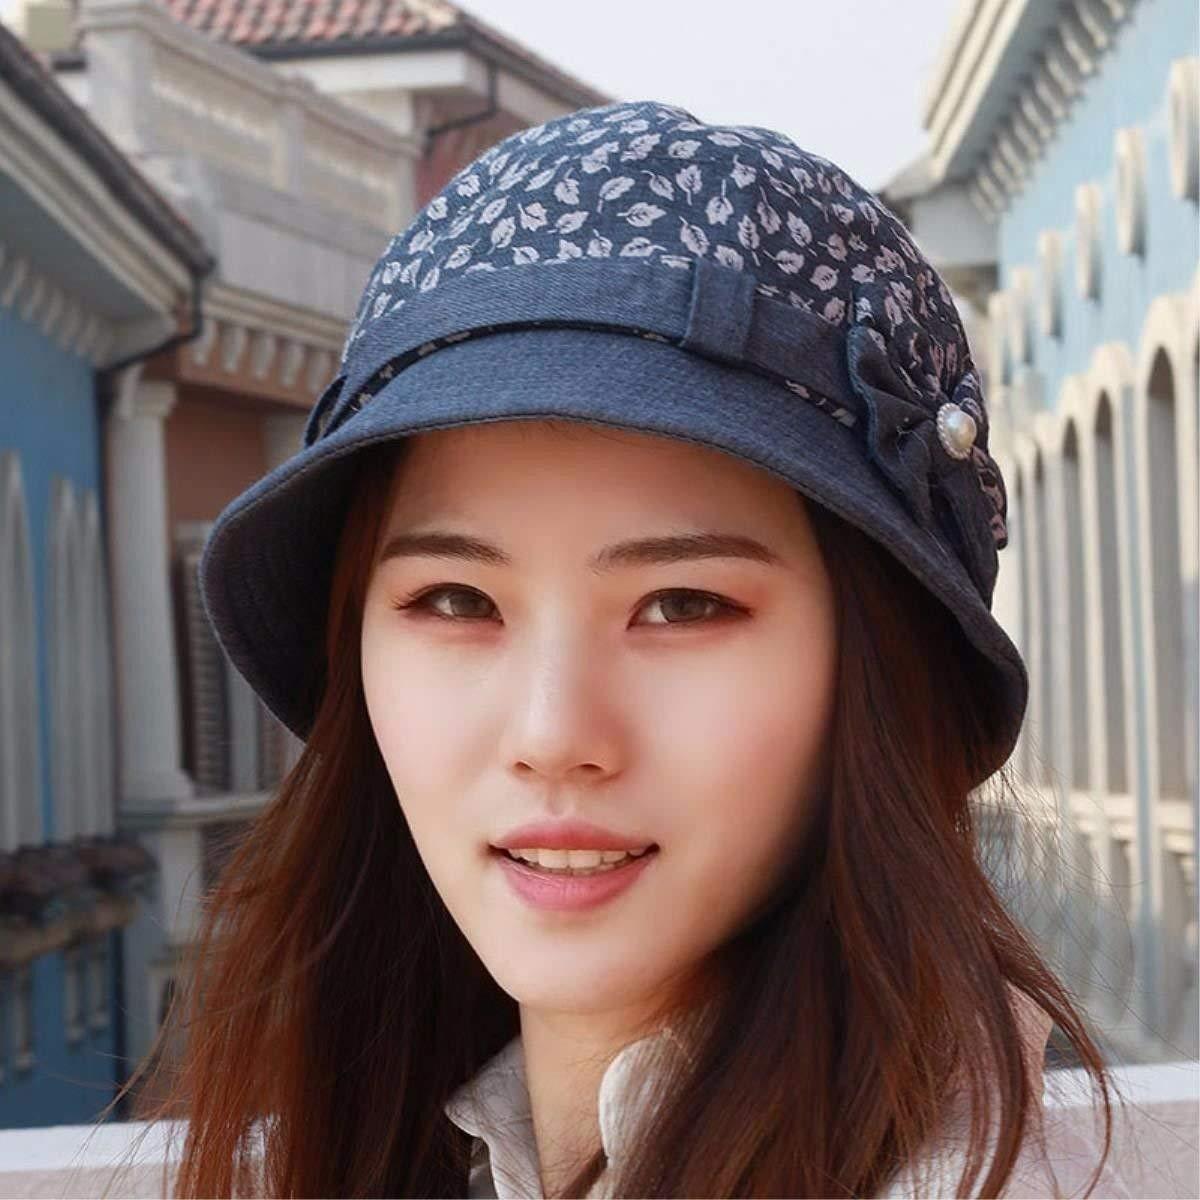 3ffe072403c Get Quotations · LONFENN Ladies Women Hats Basin Cap The Cap Spring Summer Fashion  Cap Mother Cap Outdoor Visor